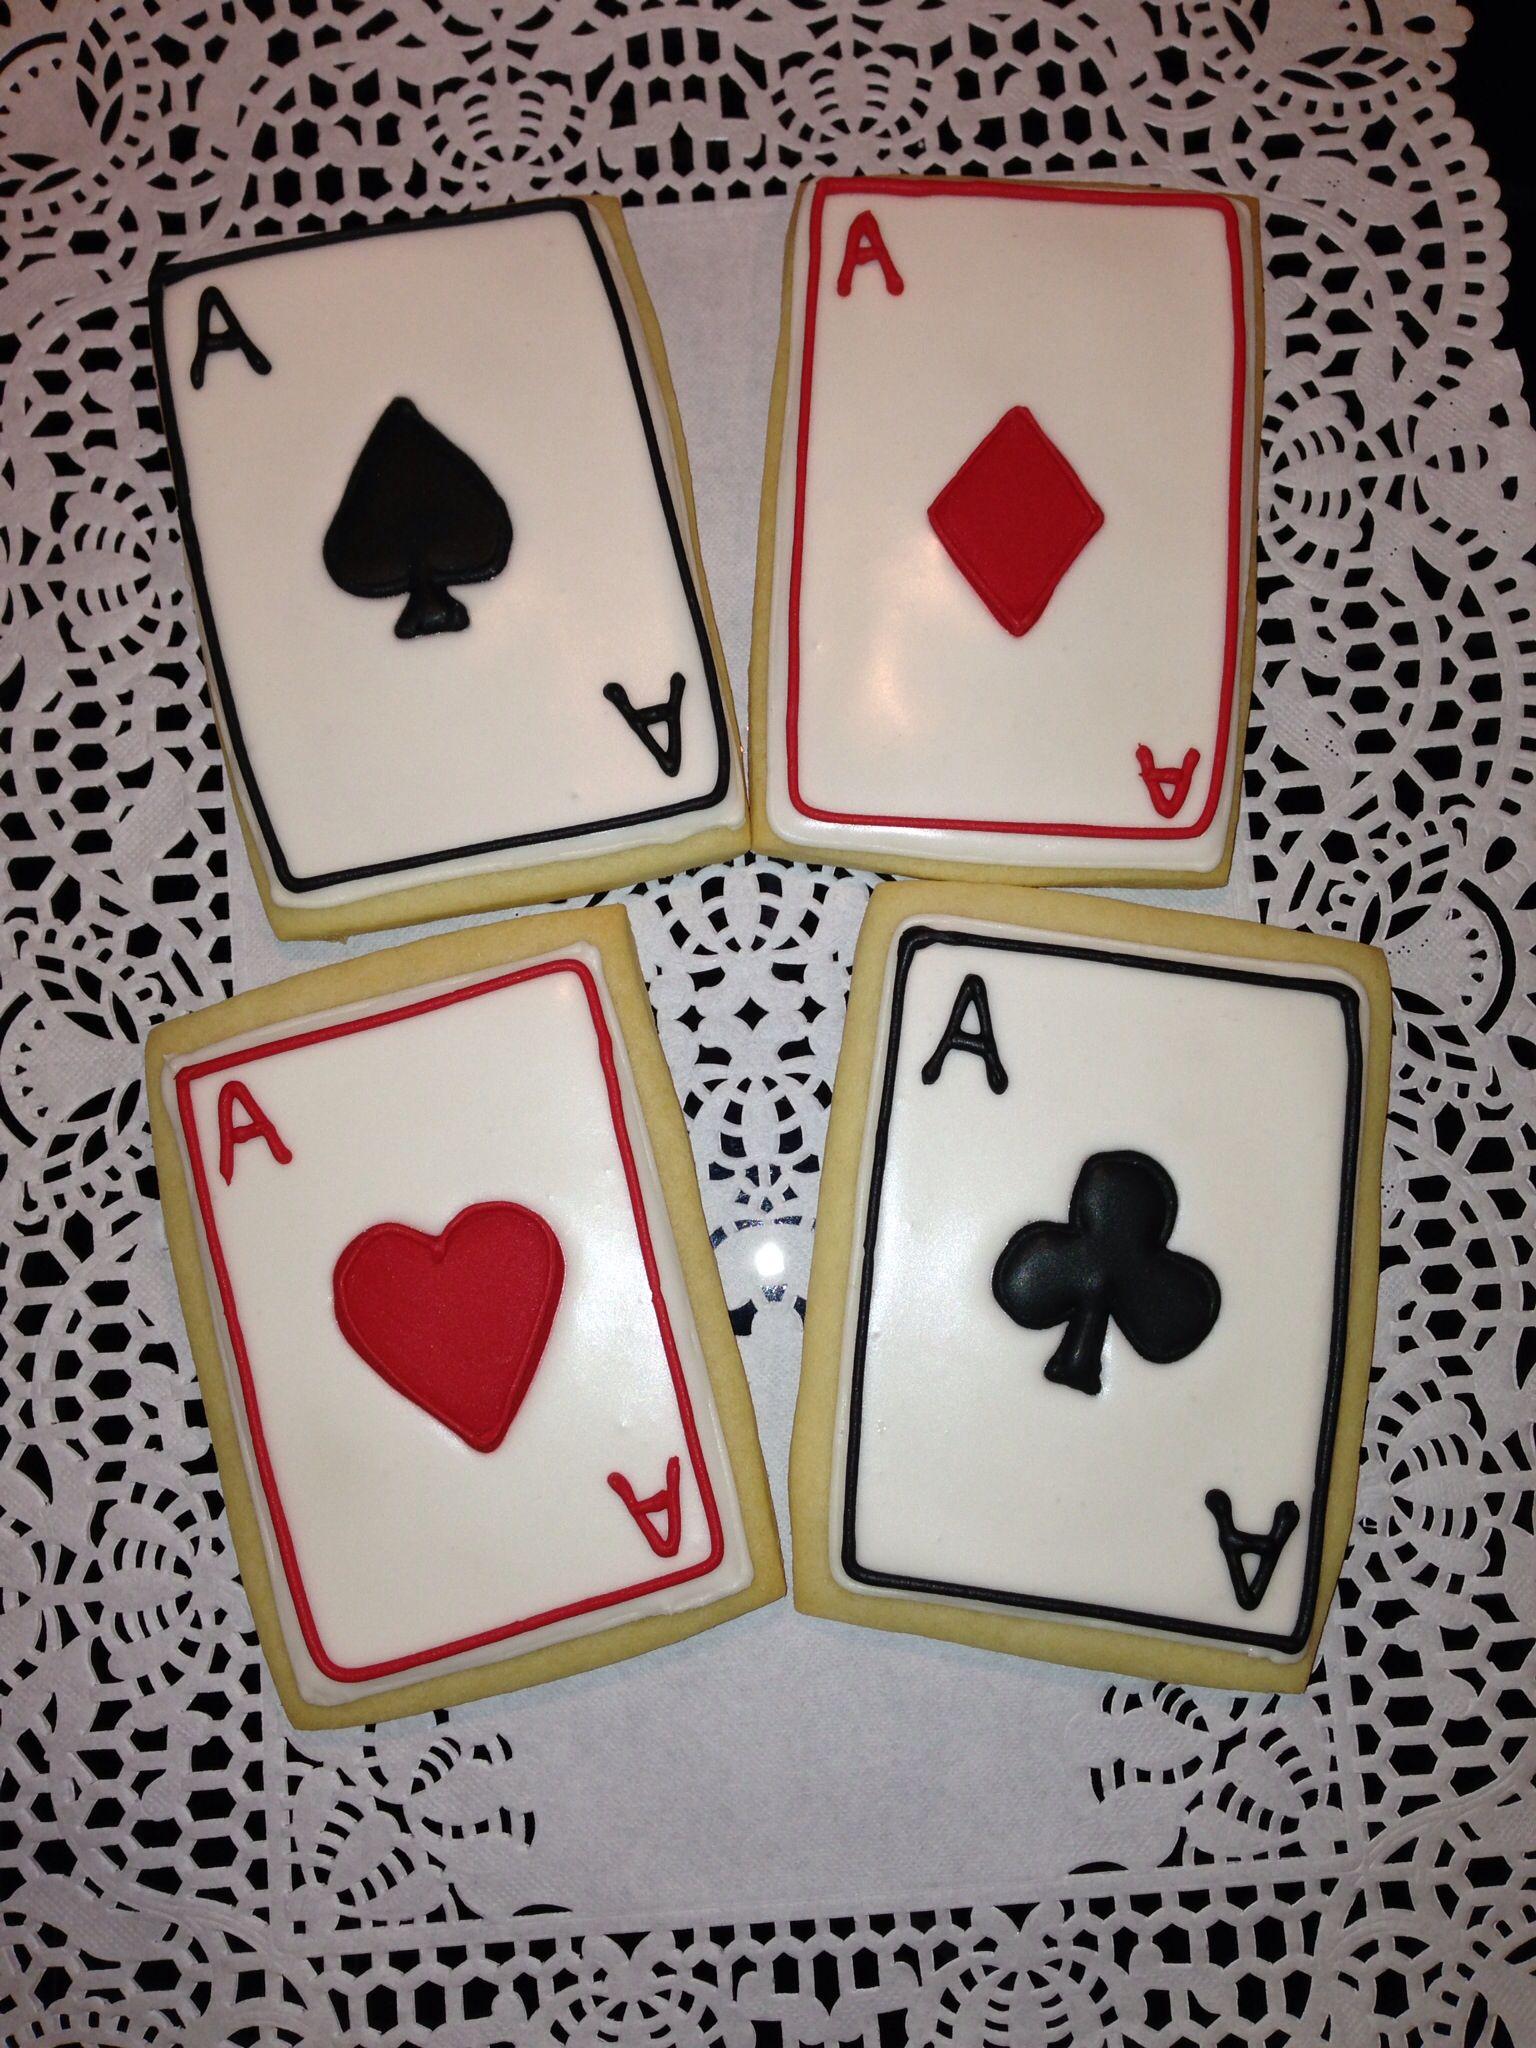 World series of poker real money